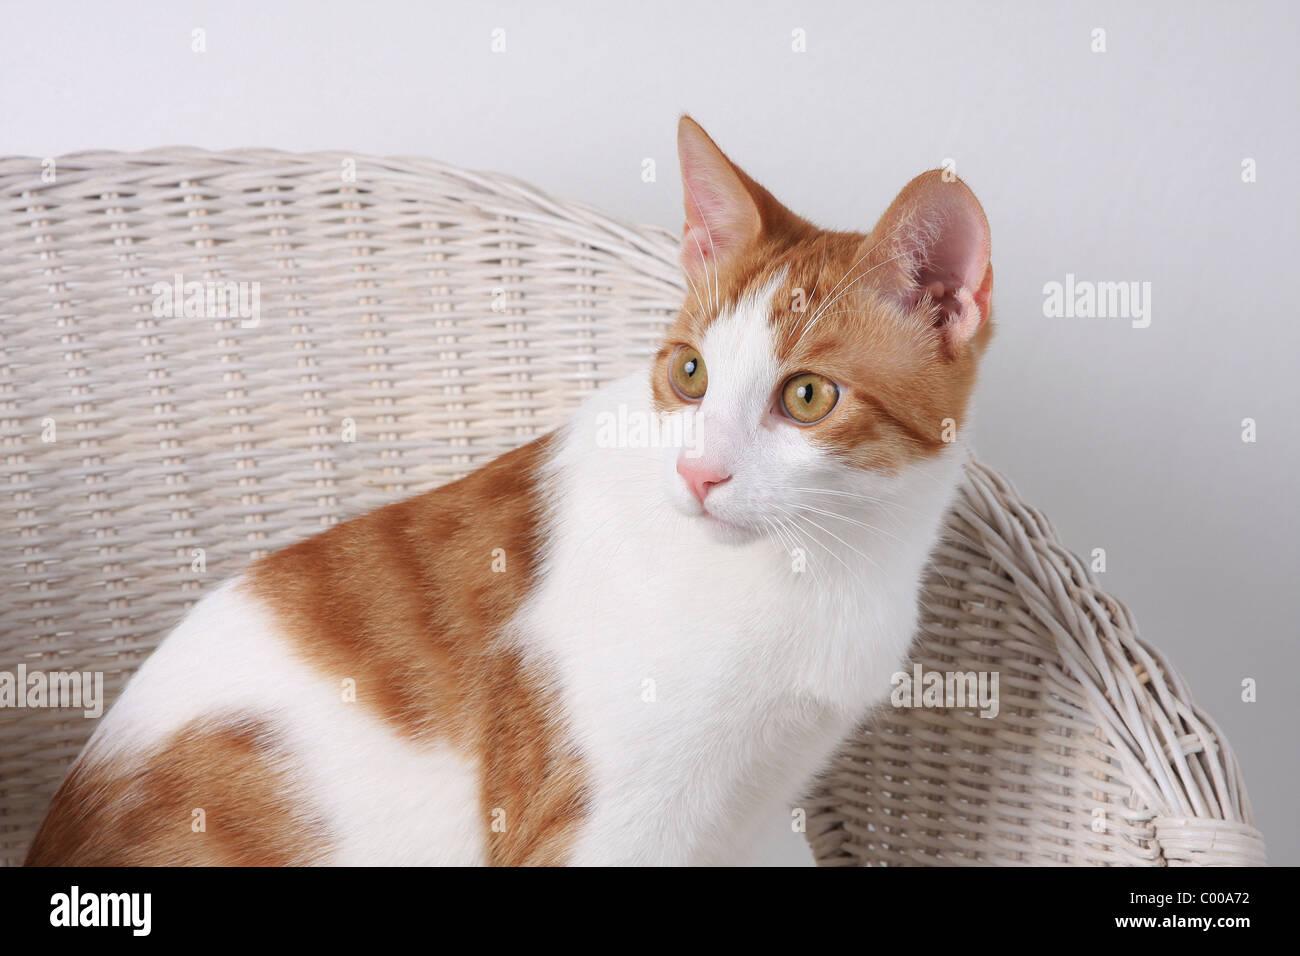 Hauskatze, dunkelrot-weiss, im Korbsessel, Felis silvestris forma catus, Domestic-cat, red-white, basket chair - Stock Image